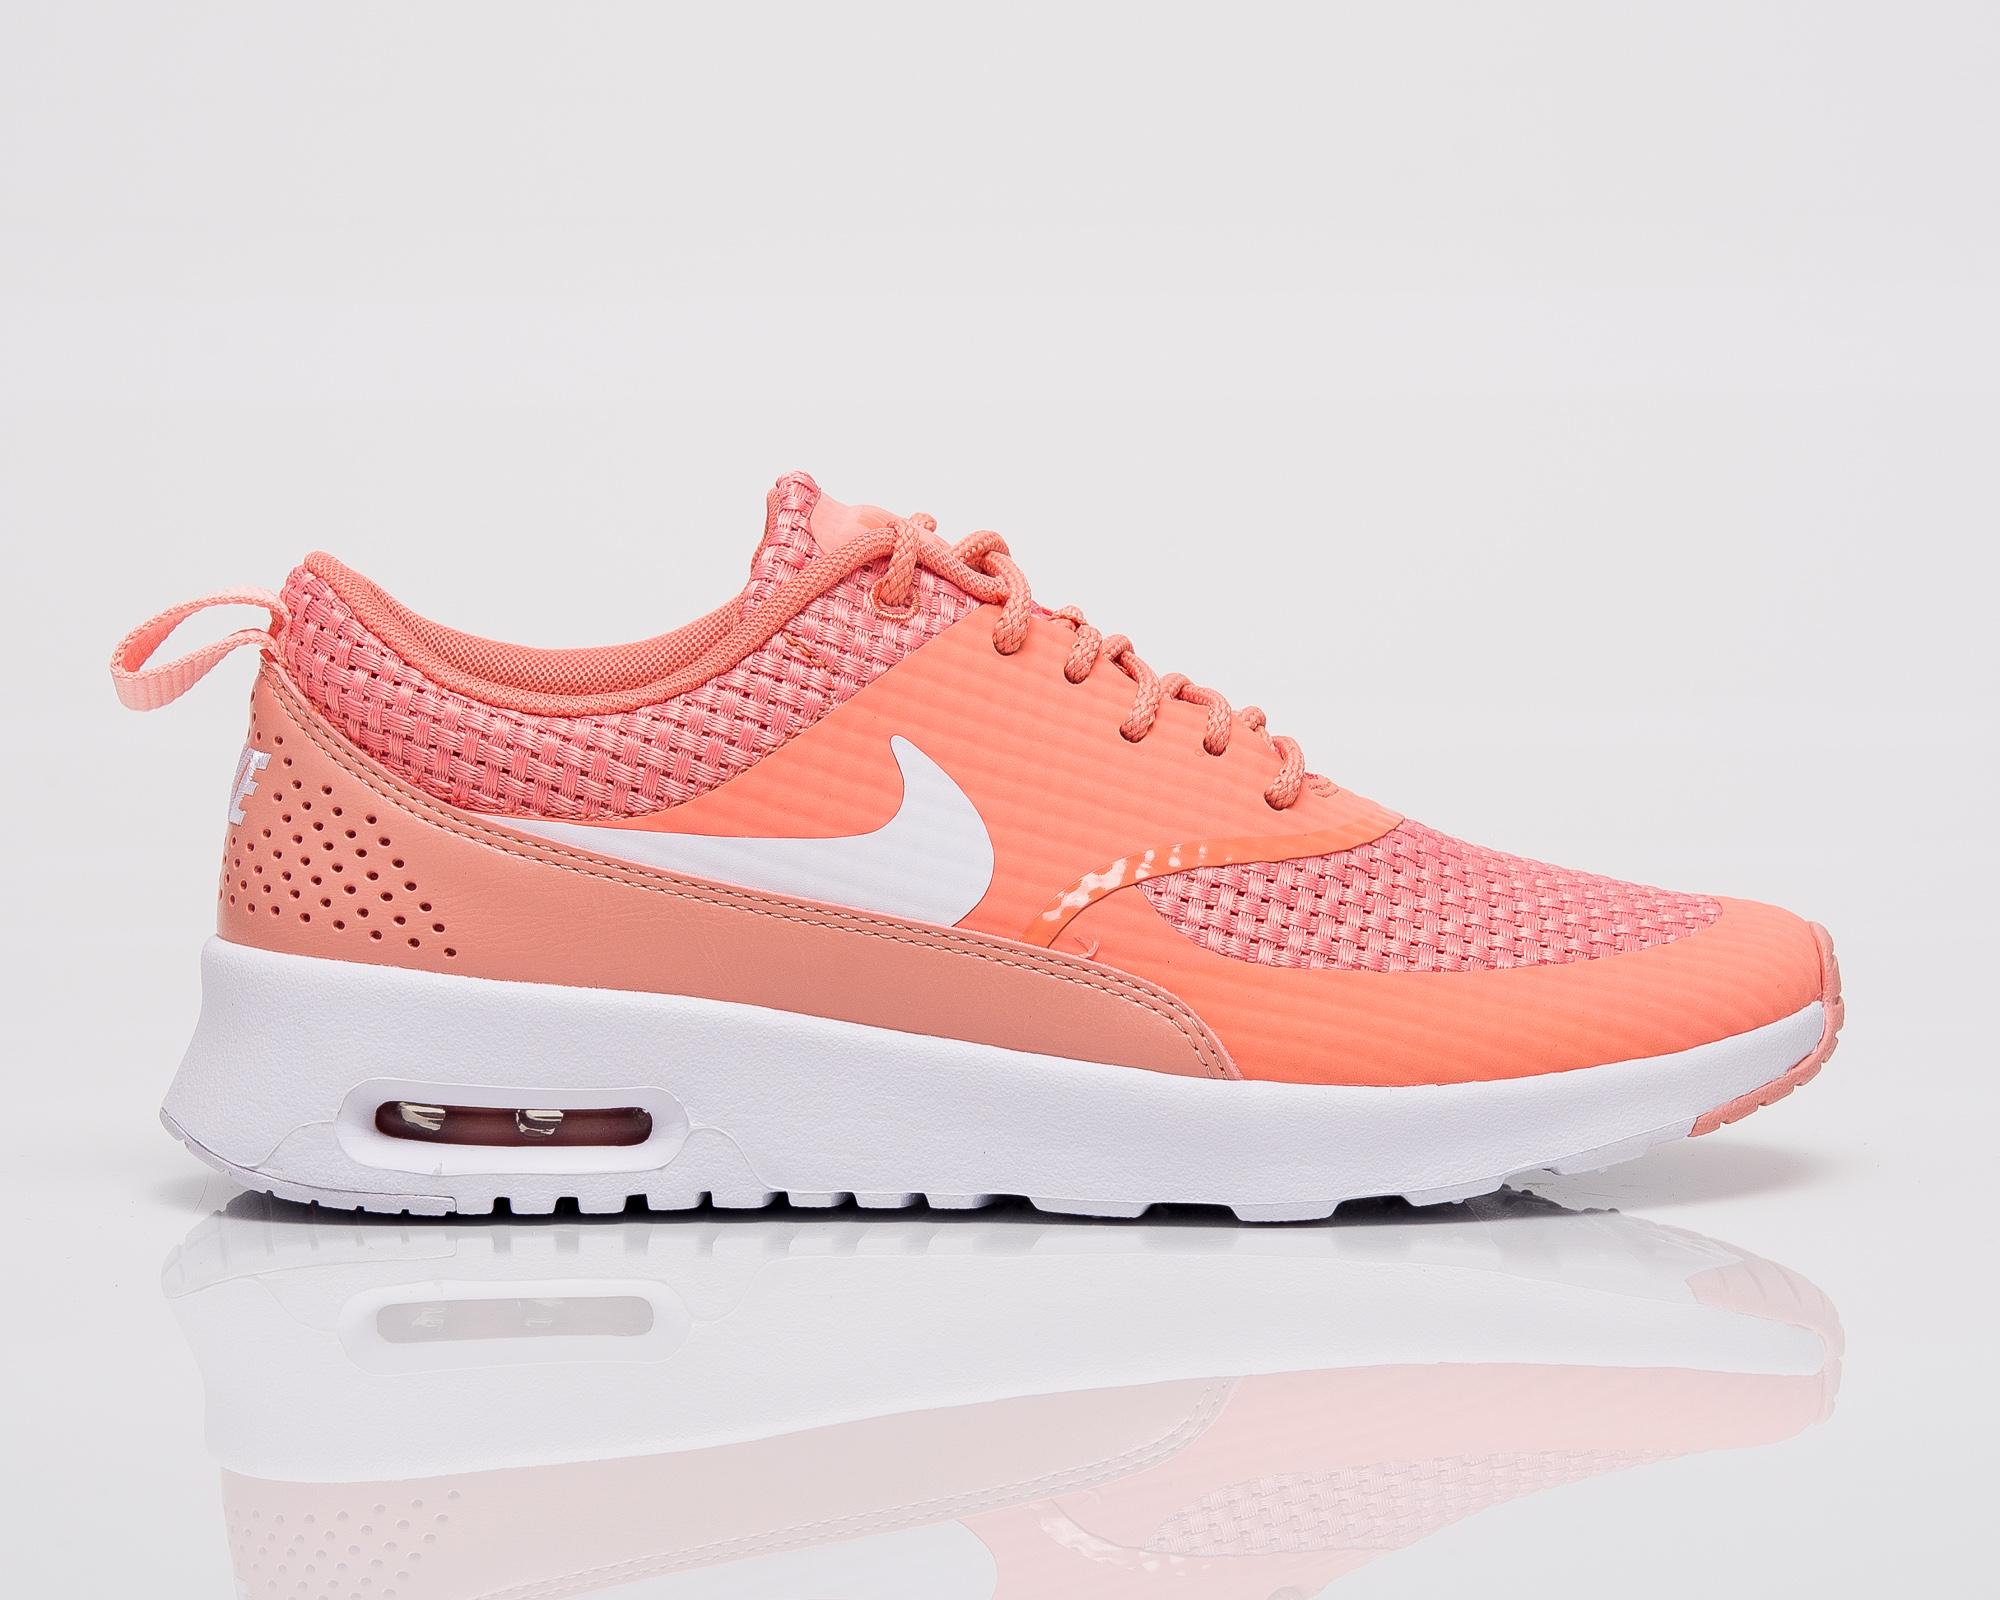 Nike Wmns Air Max Thea Premium Shoes Casual Sporting